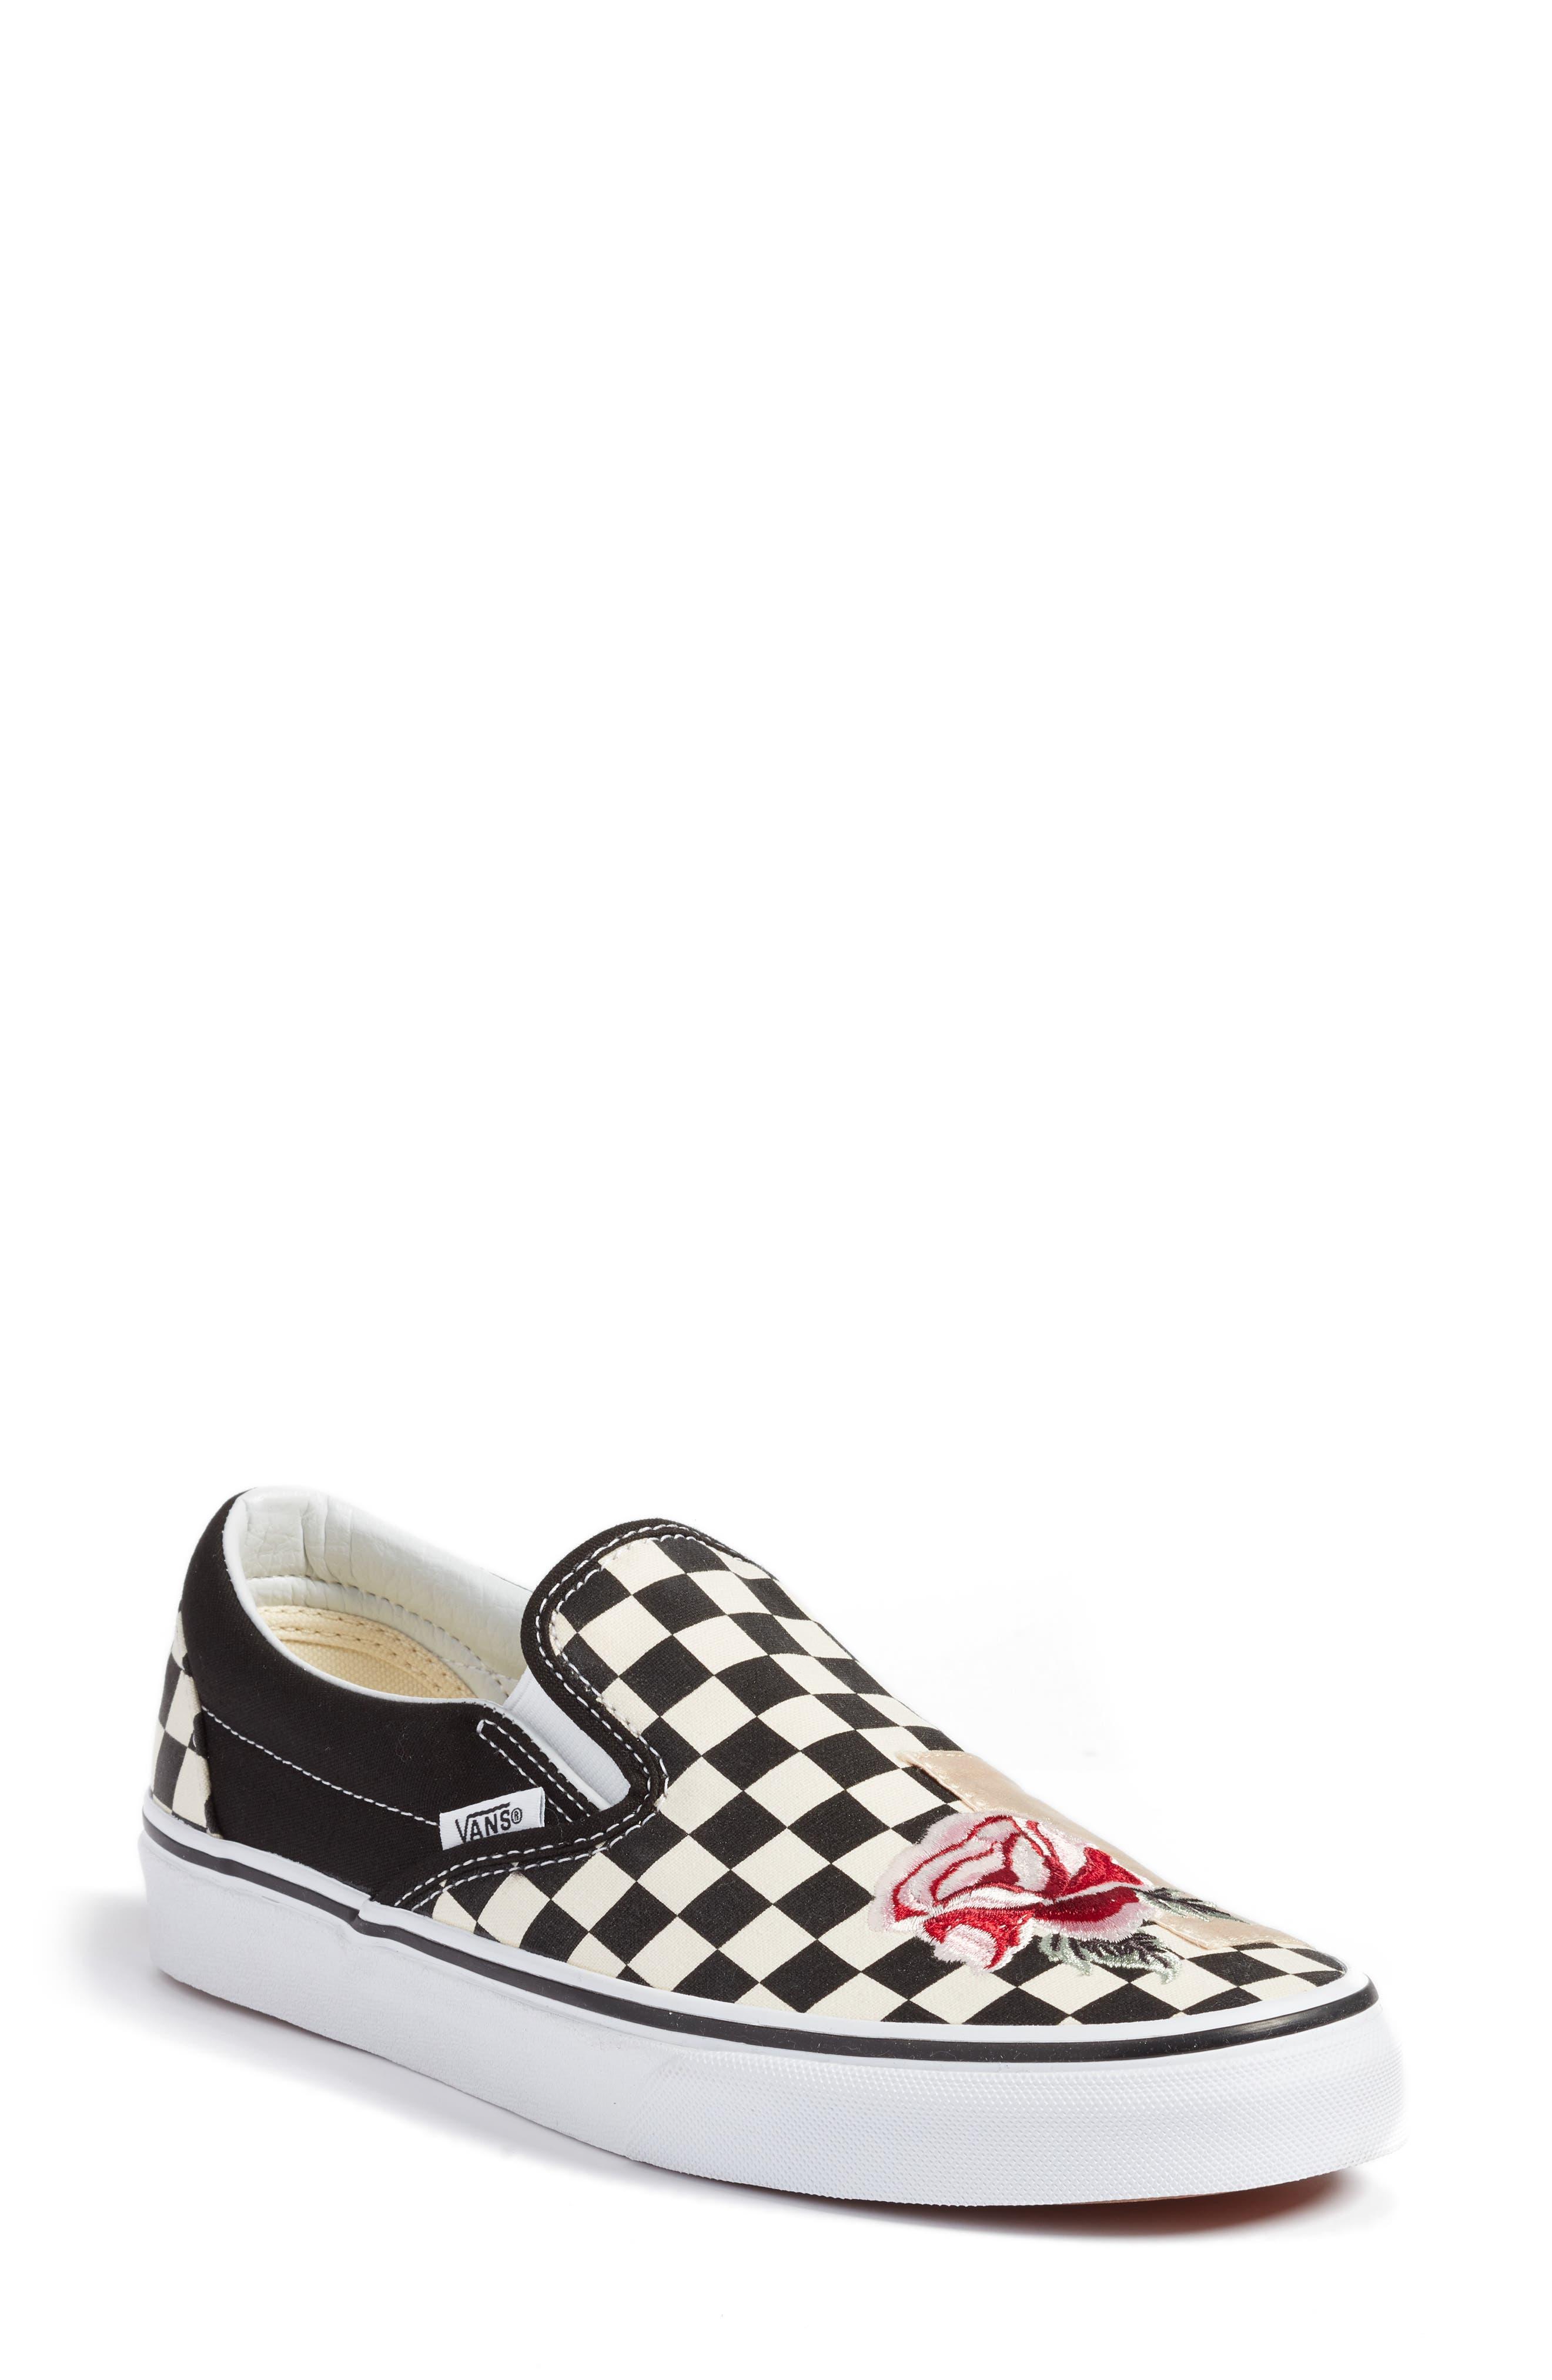 UA Classic Slip-On Sneaker,                         Main,                         color, CHECKER/ ROSE